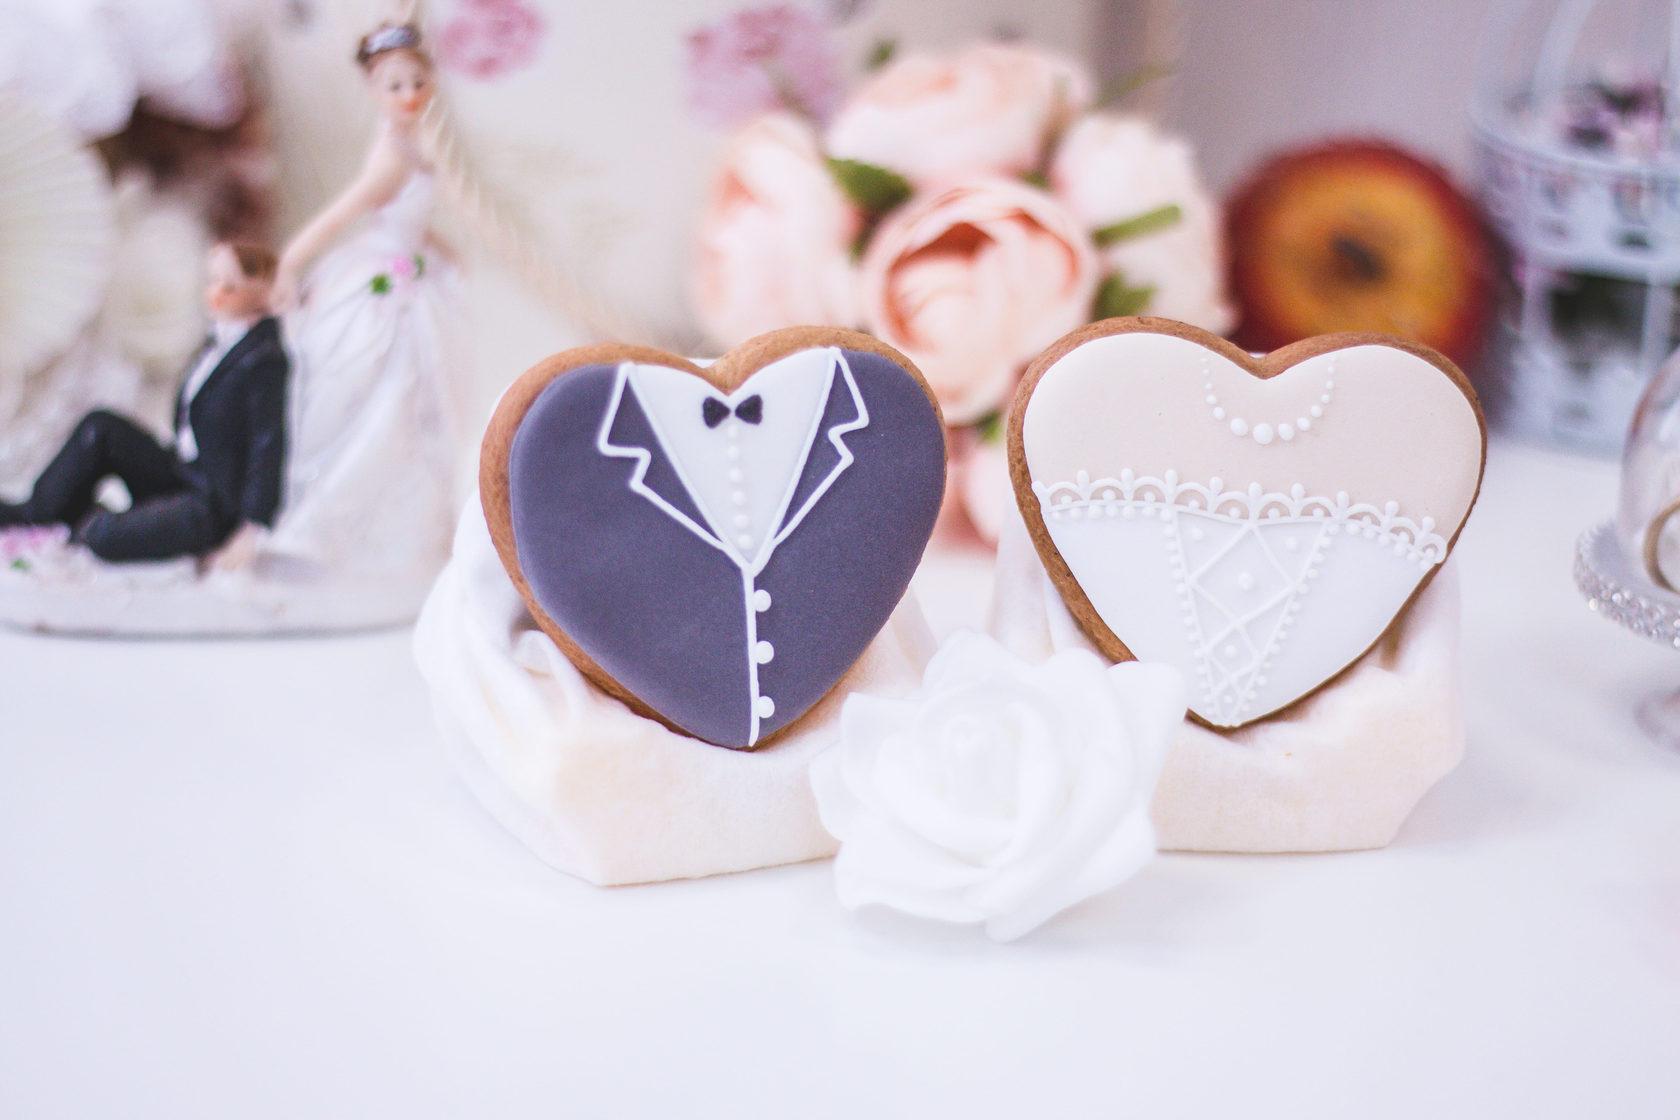 Свадьба сына матюшенко фото последнее